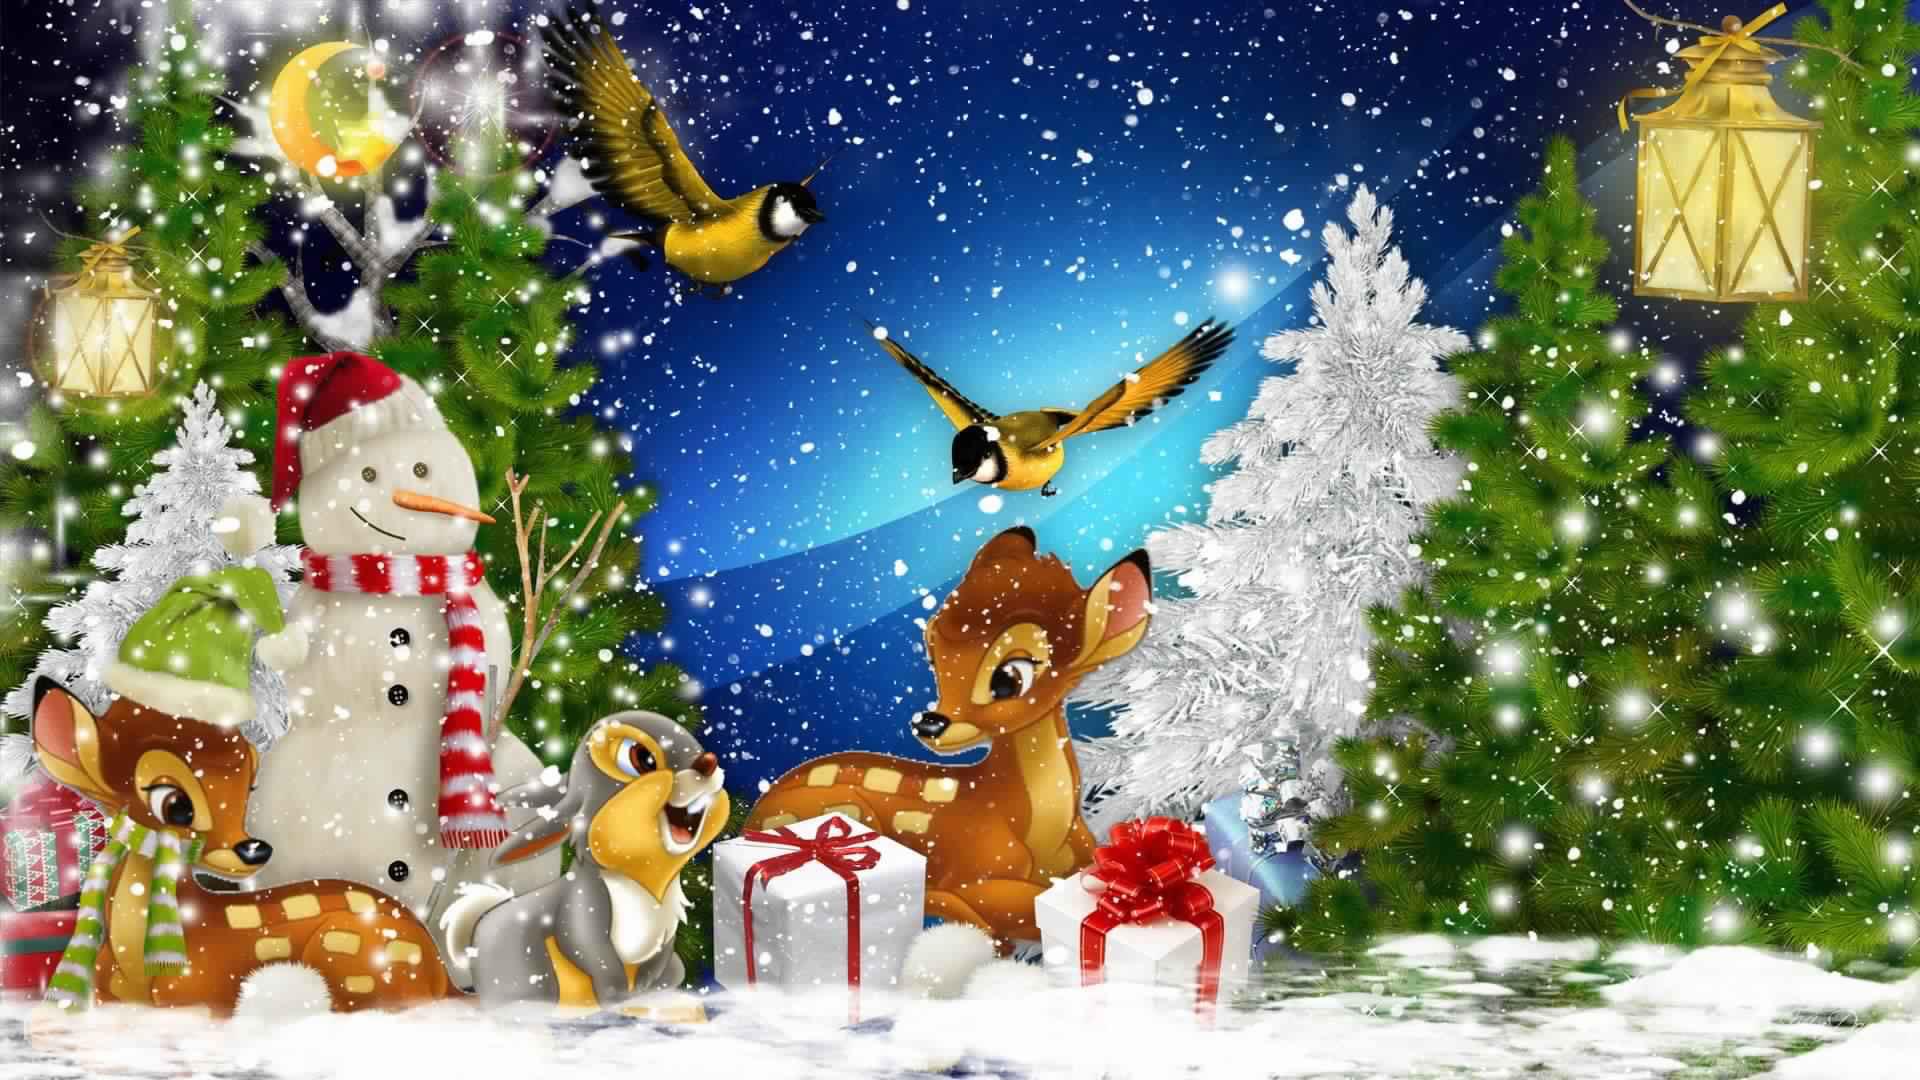 Santa Winter Bambi Thumper Christmas Snowy Snowman Birds Deer Trees Bunny Snow Gifts Winter Rabbit Wallpaper Pictures Hd